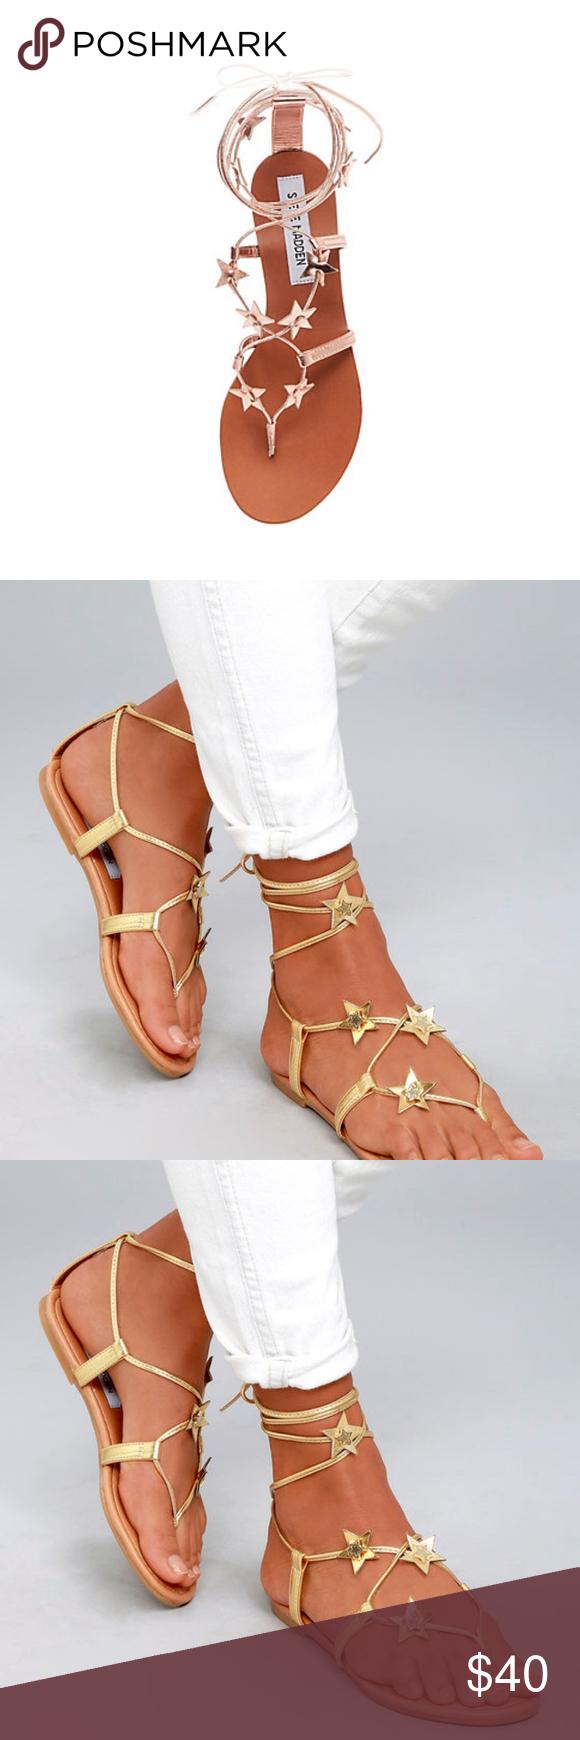 d9d22424e0cd Steve Madden Lace Up Sandals Steve Madden Jupiter Gold Lace-Up Sandals - SOLD  OUT